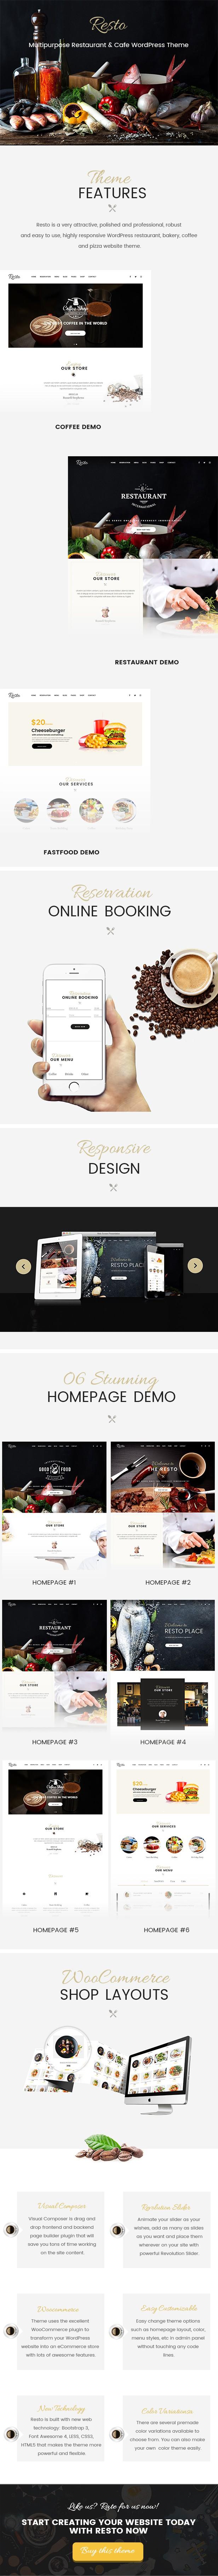 Multipurpose Restaurant & Cafe WordPress Theme